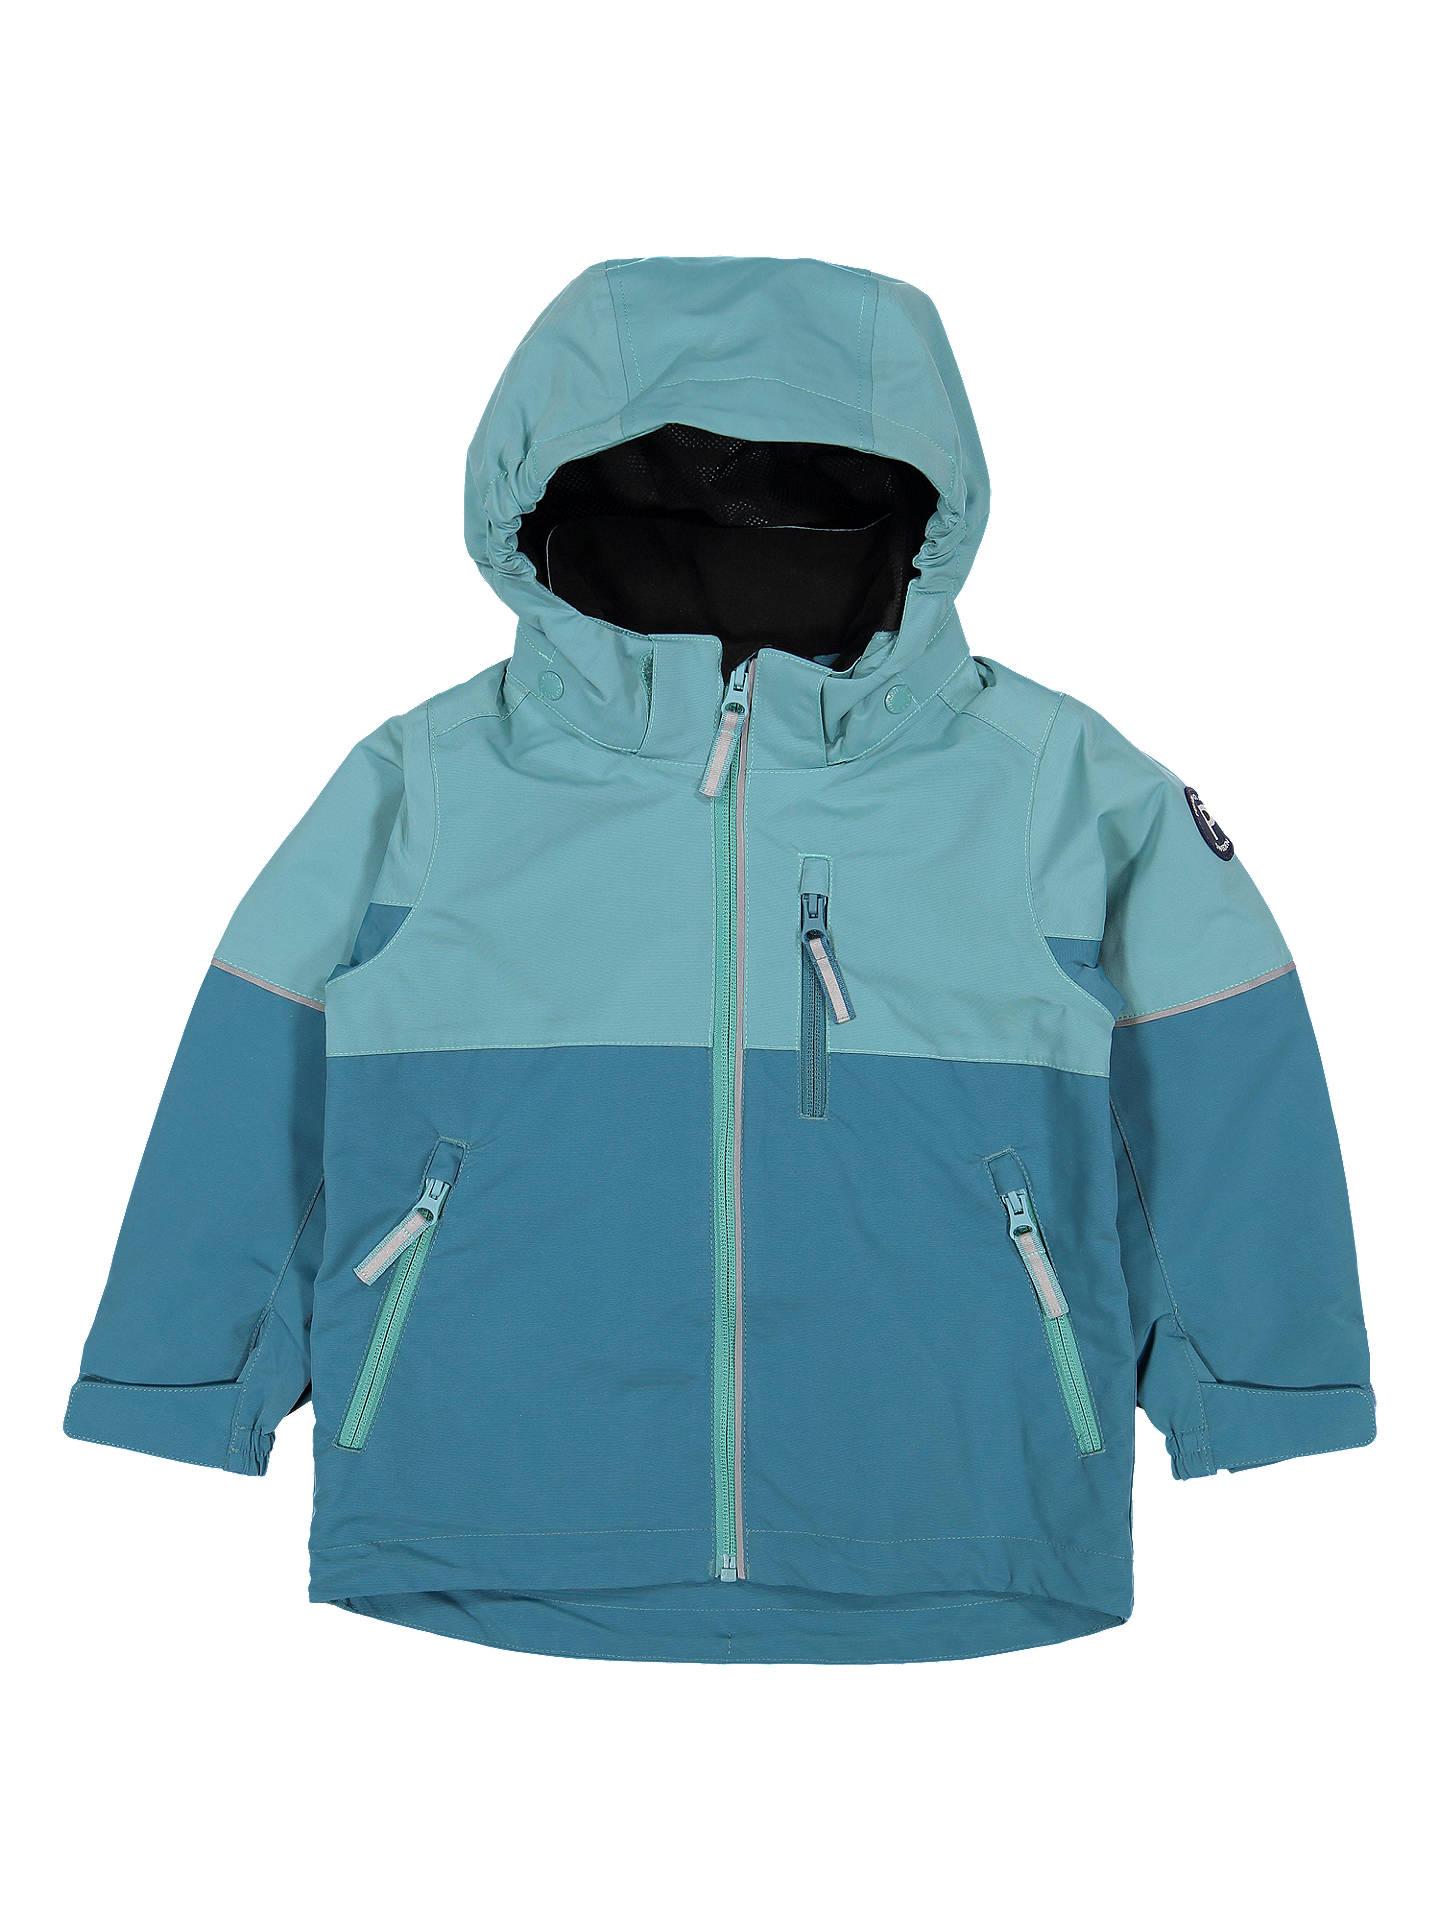 6772cfb43 Polarn O. Pyret Children s Waterproof Shell Jacket